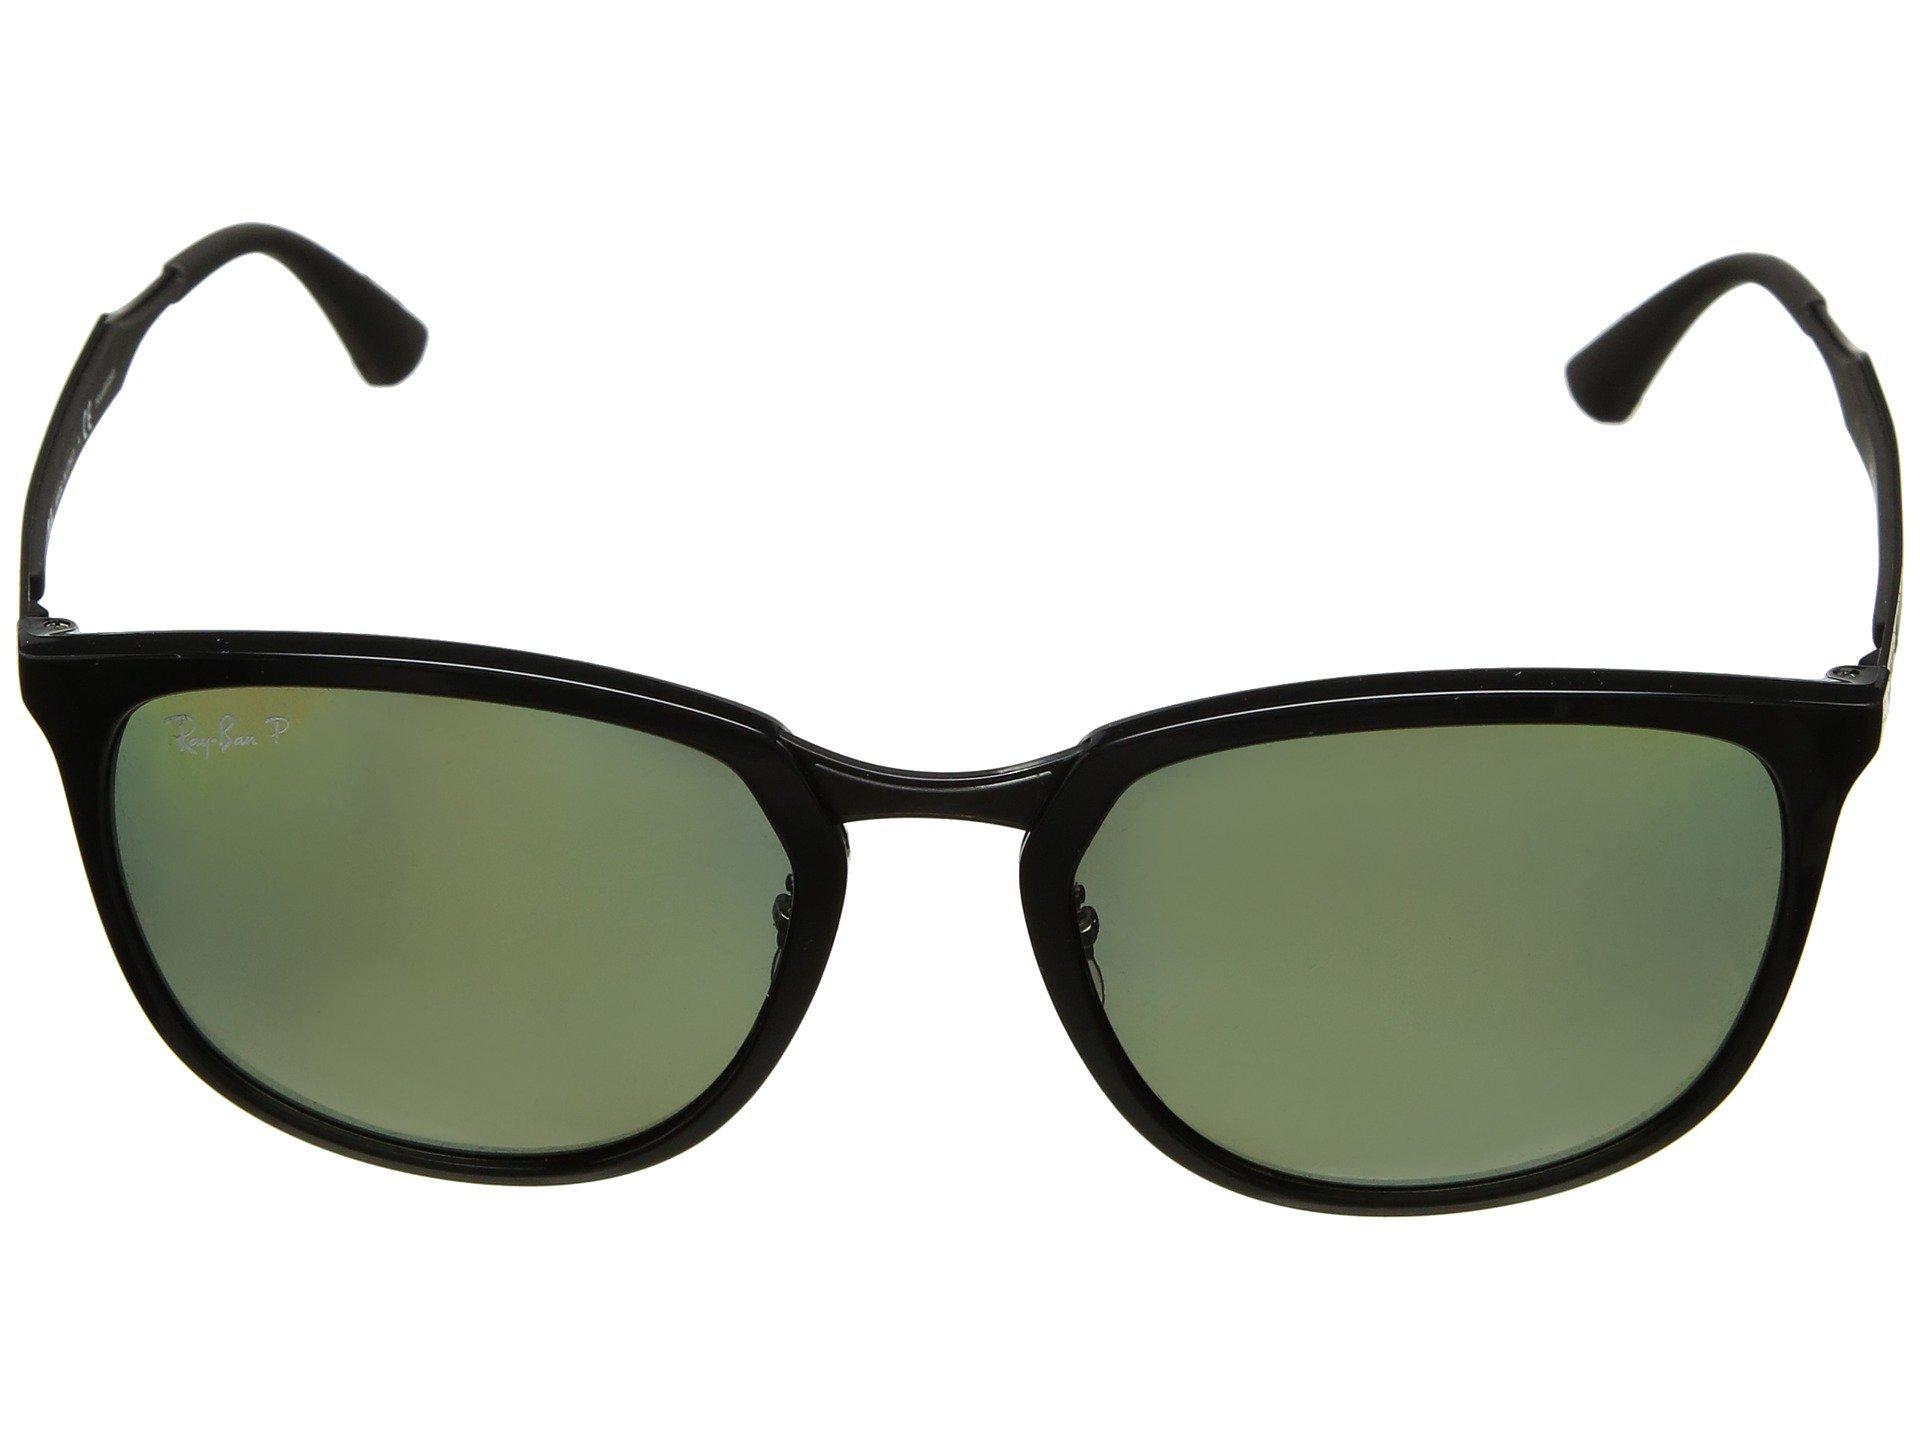 6e6a76663f4 Ray-Ban - Rb4299 56mm (black polarized Green Classic G-15). View fullscreen